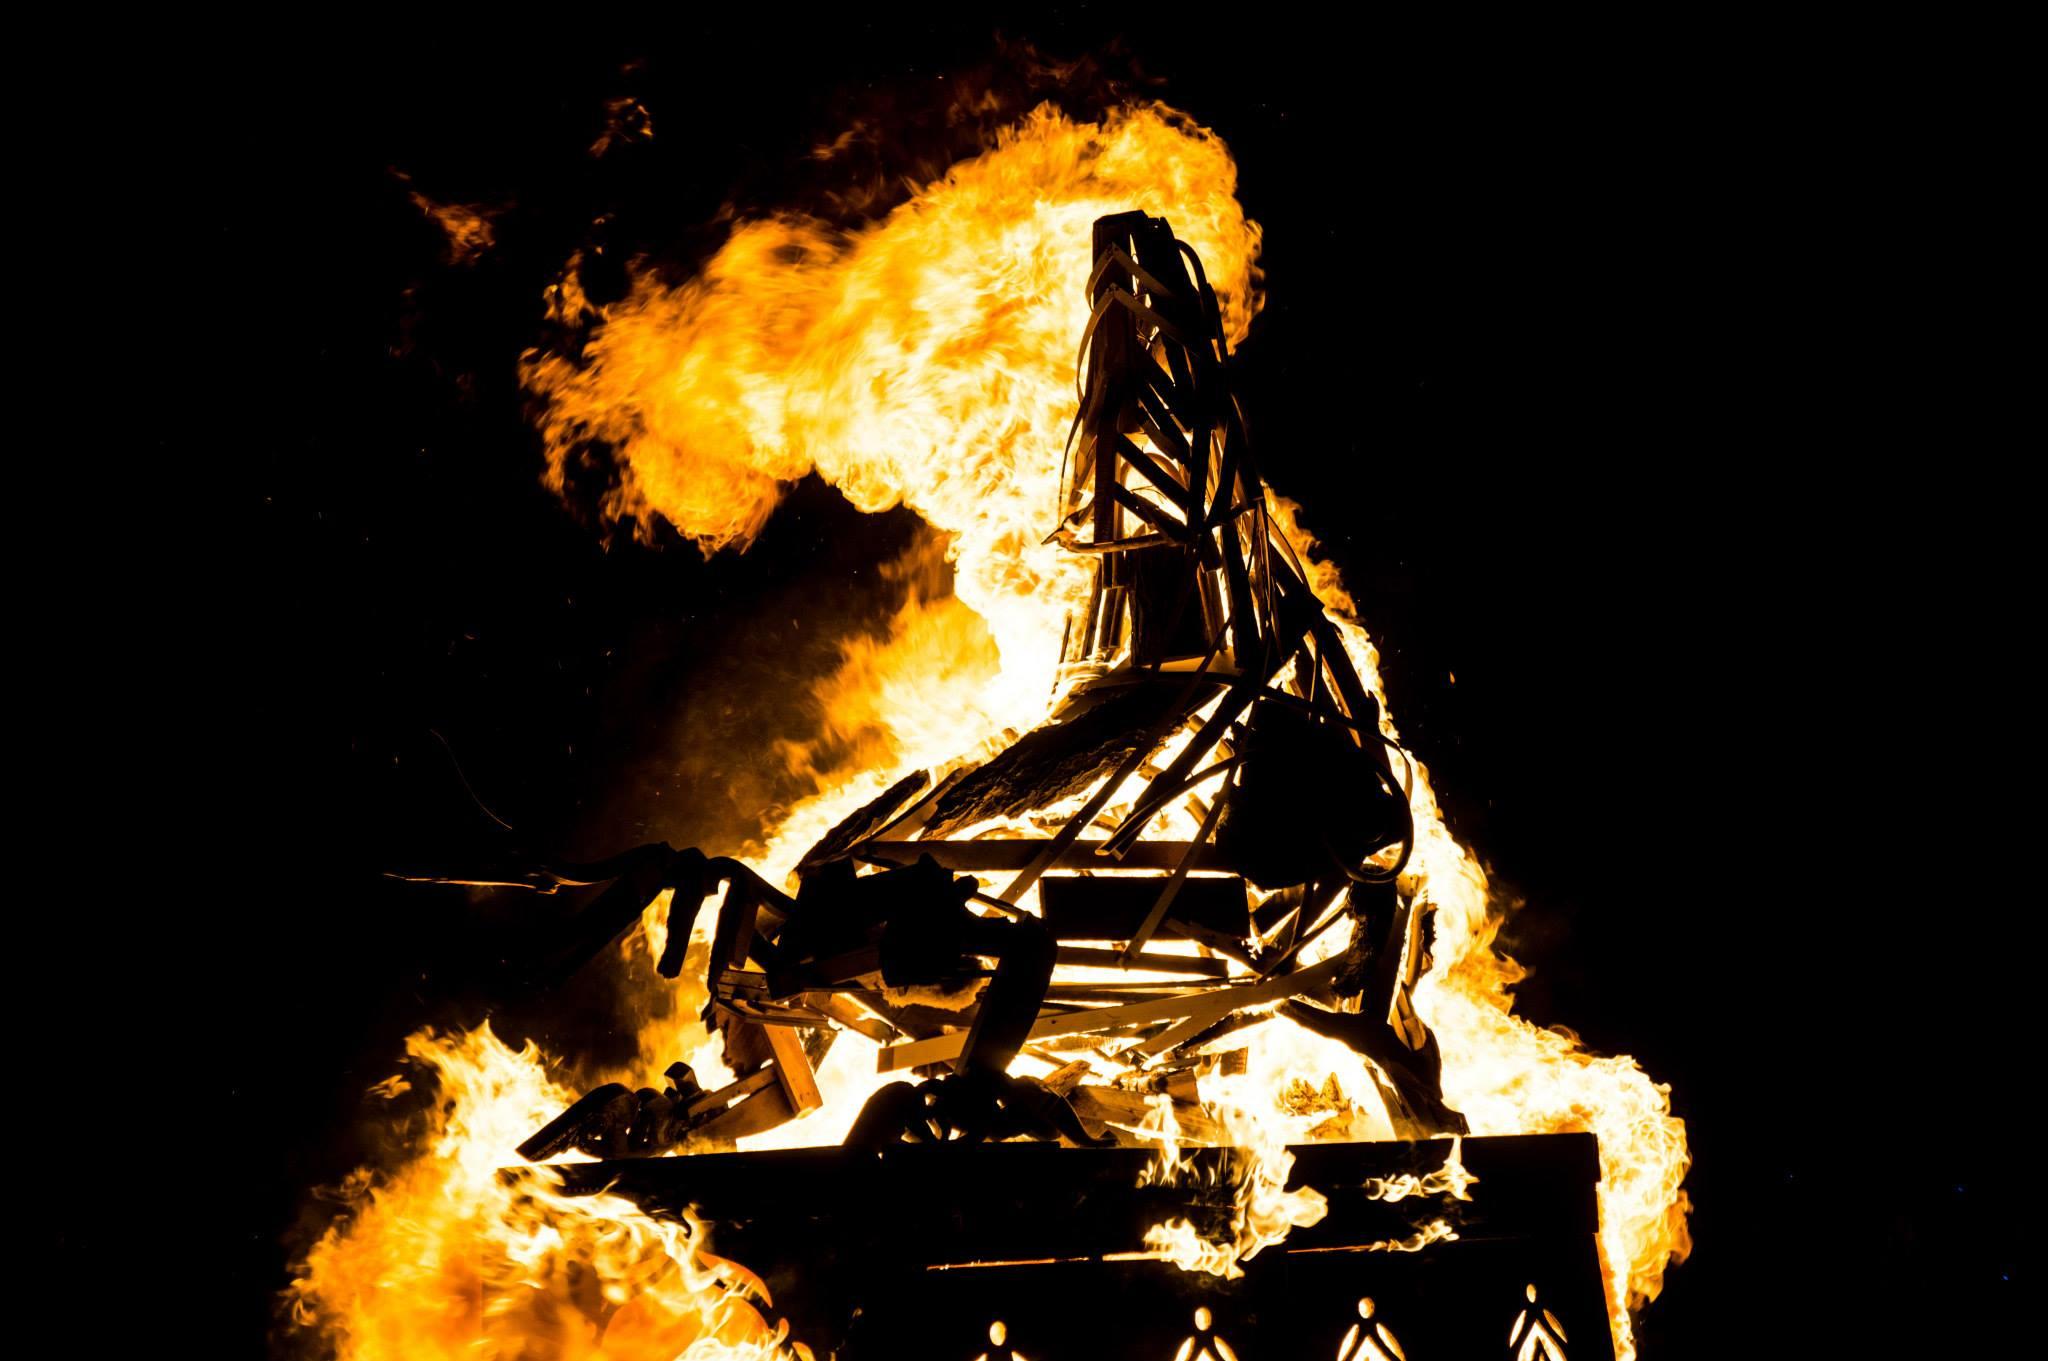 Lobo Madre - Burning Man 2013 Photo